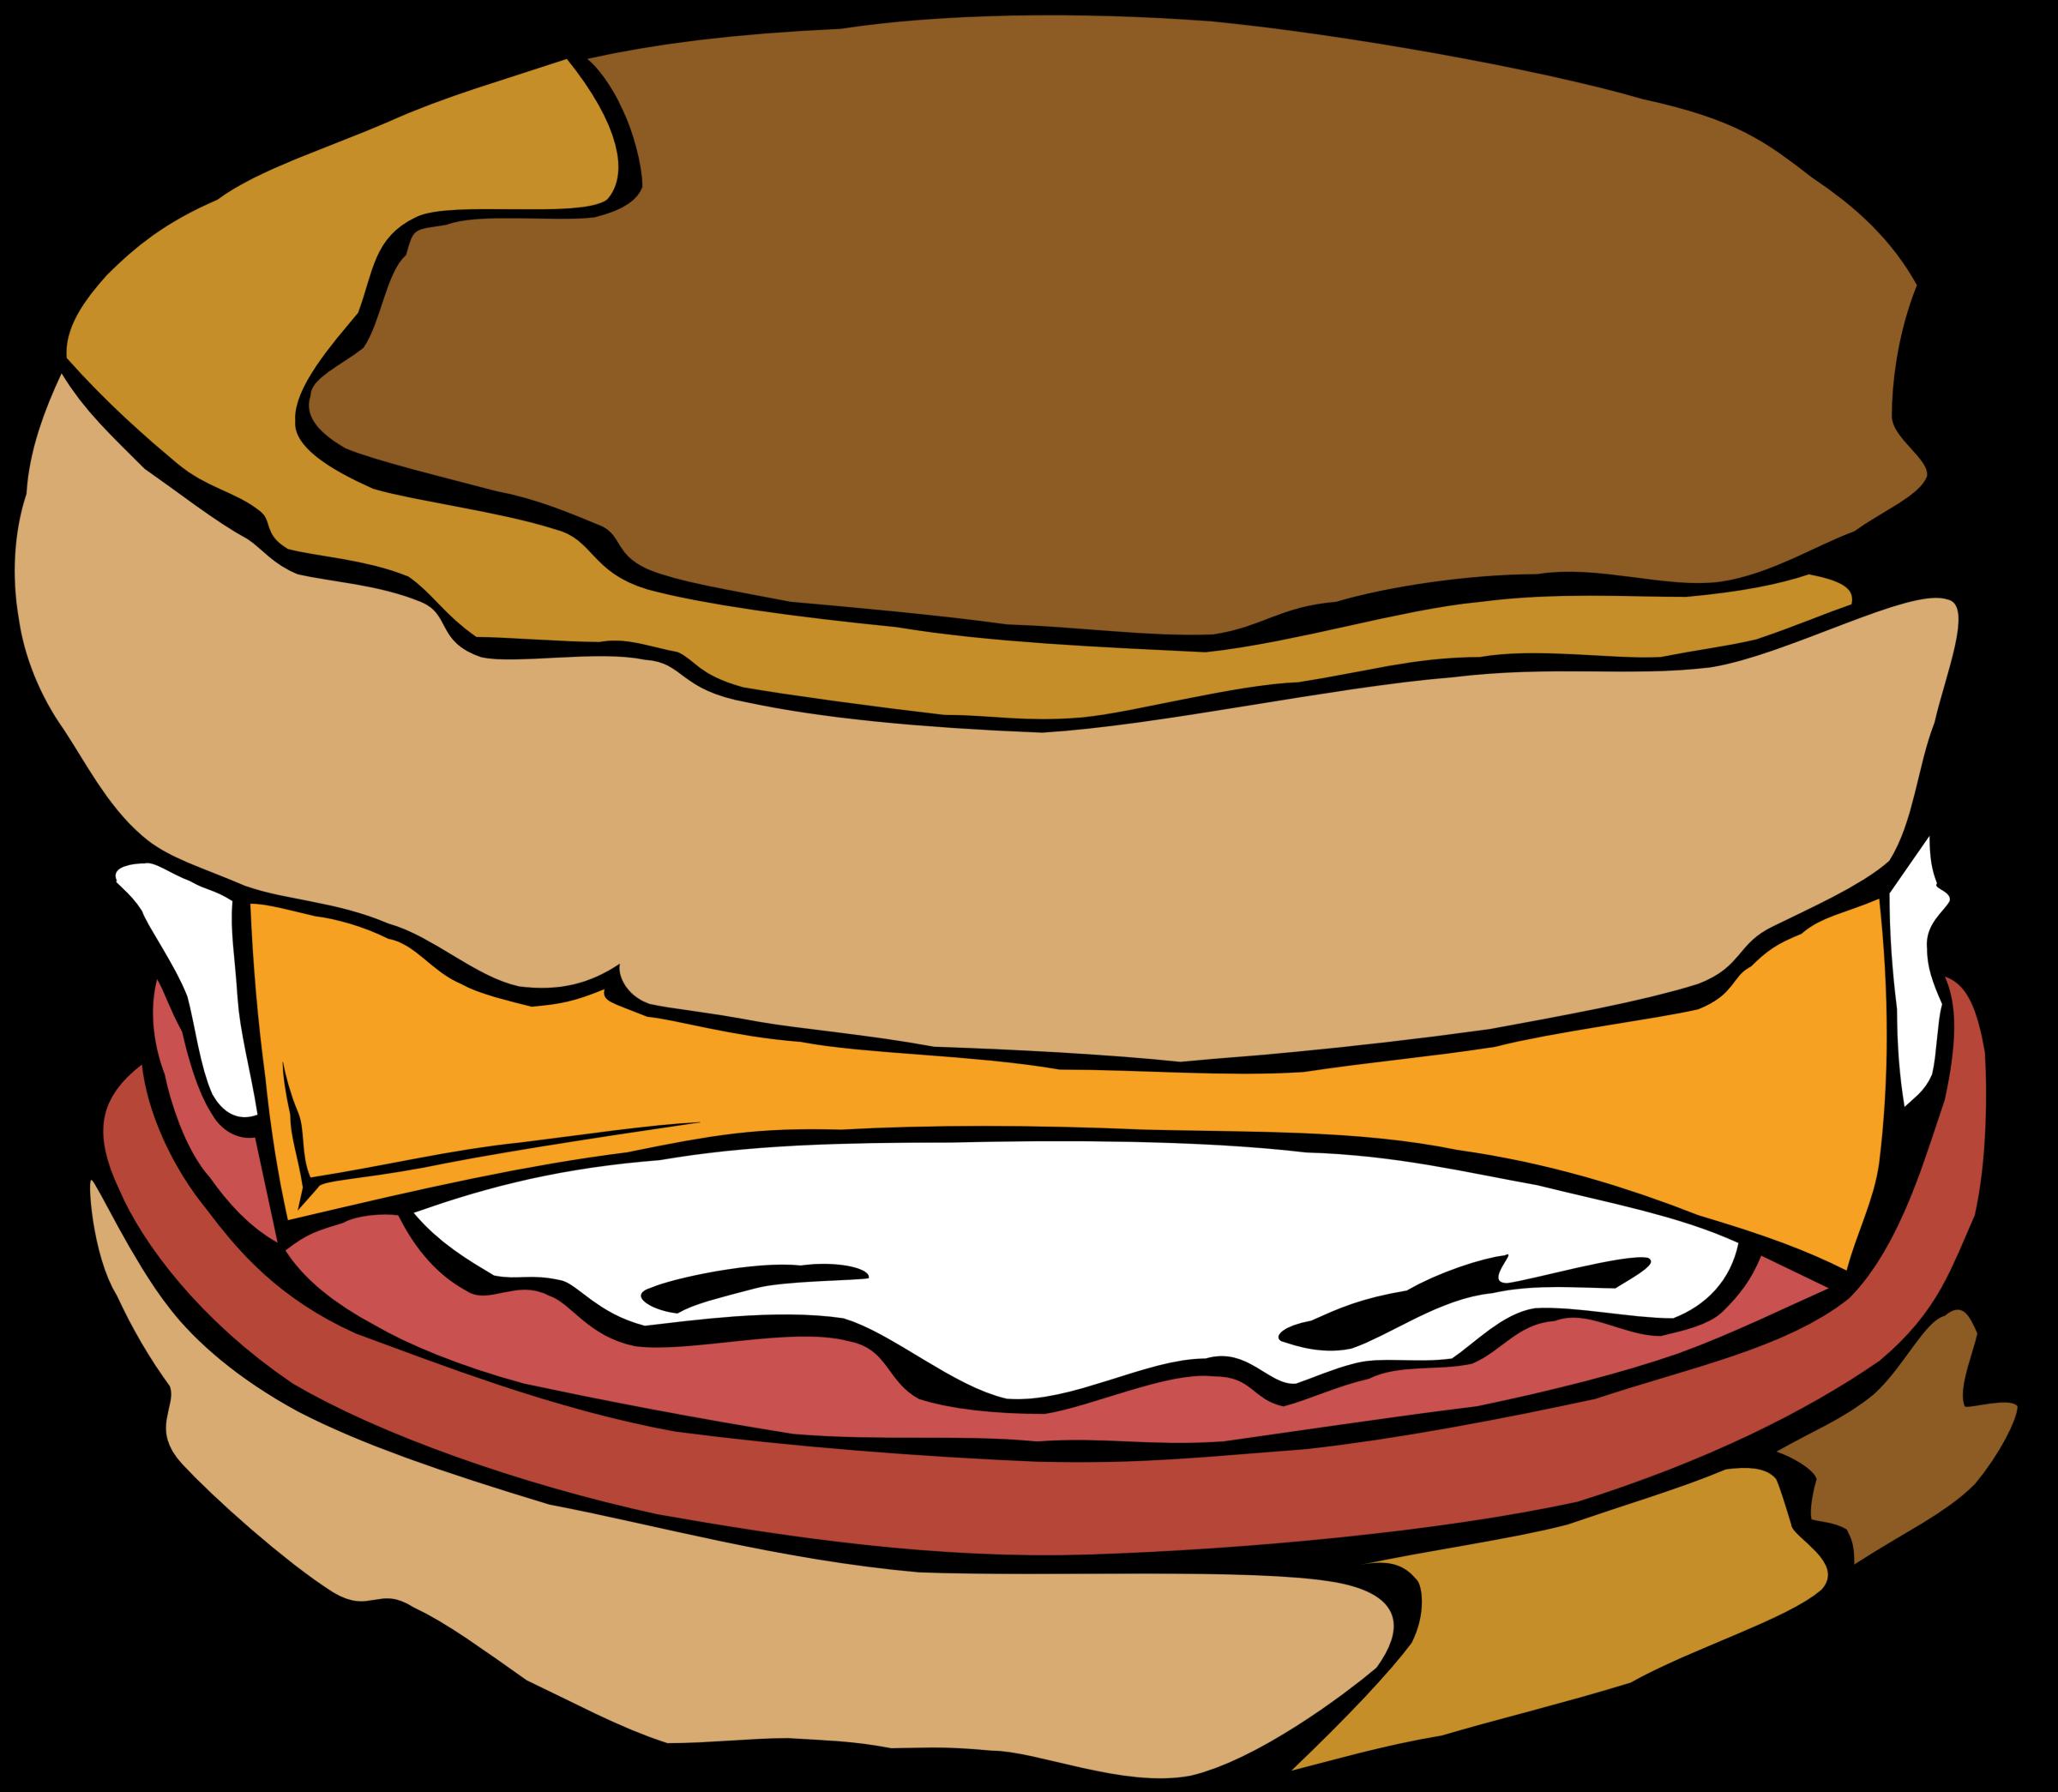 Hamburger and hot dog clipart graphic library stock Unhealthy Food Clipart at GetDrawings.com | Free for personal use ... graphic library stock